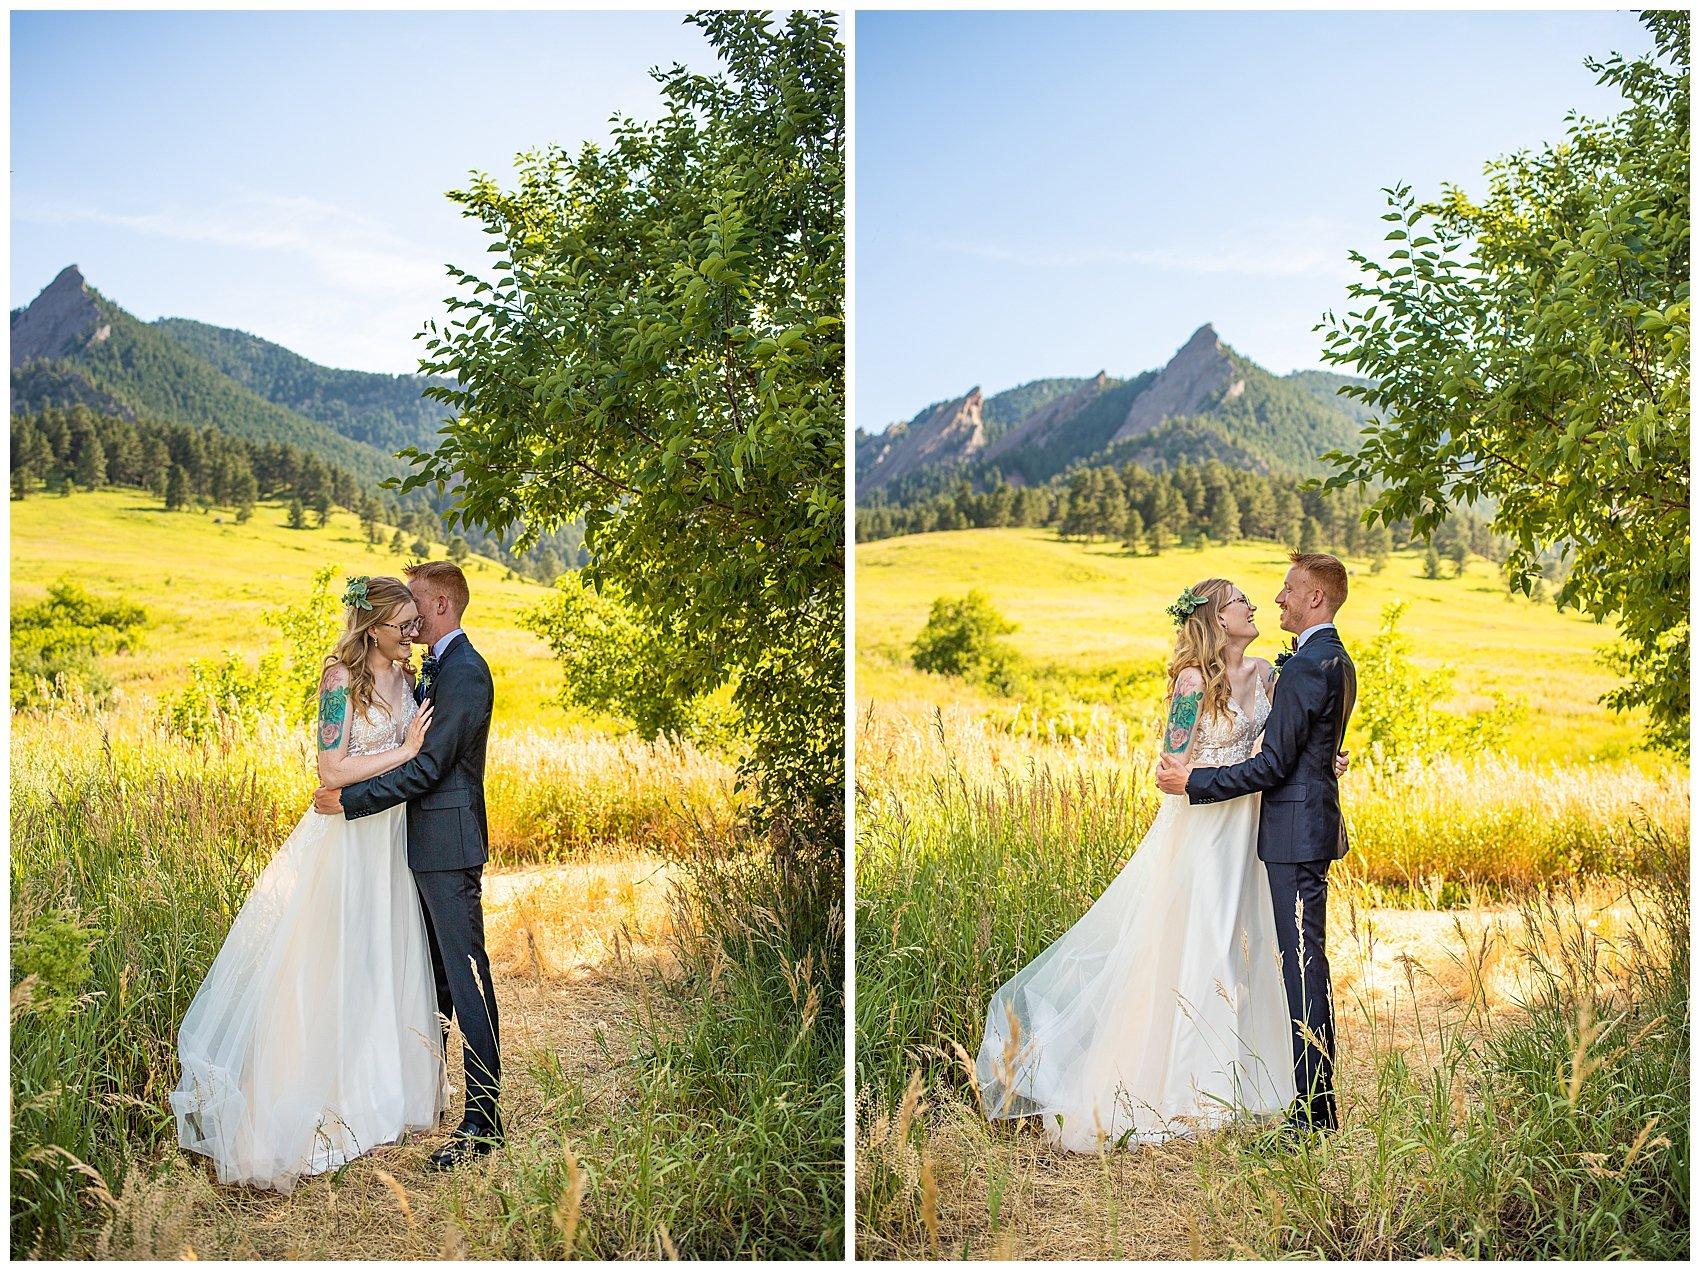 chautauqua elopement boulder photographer